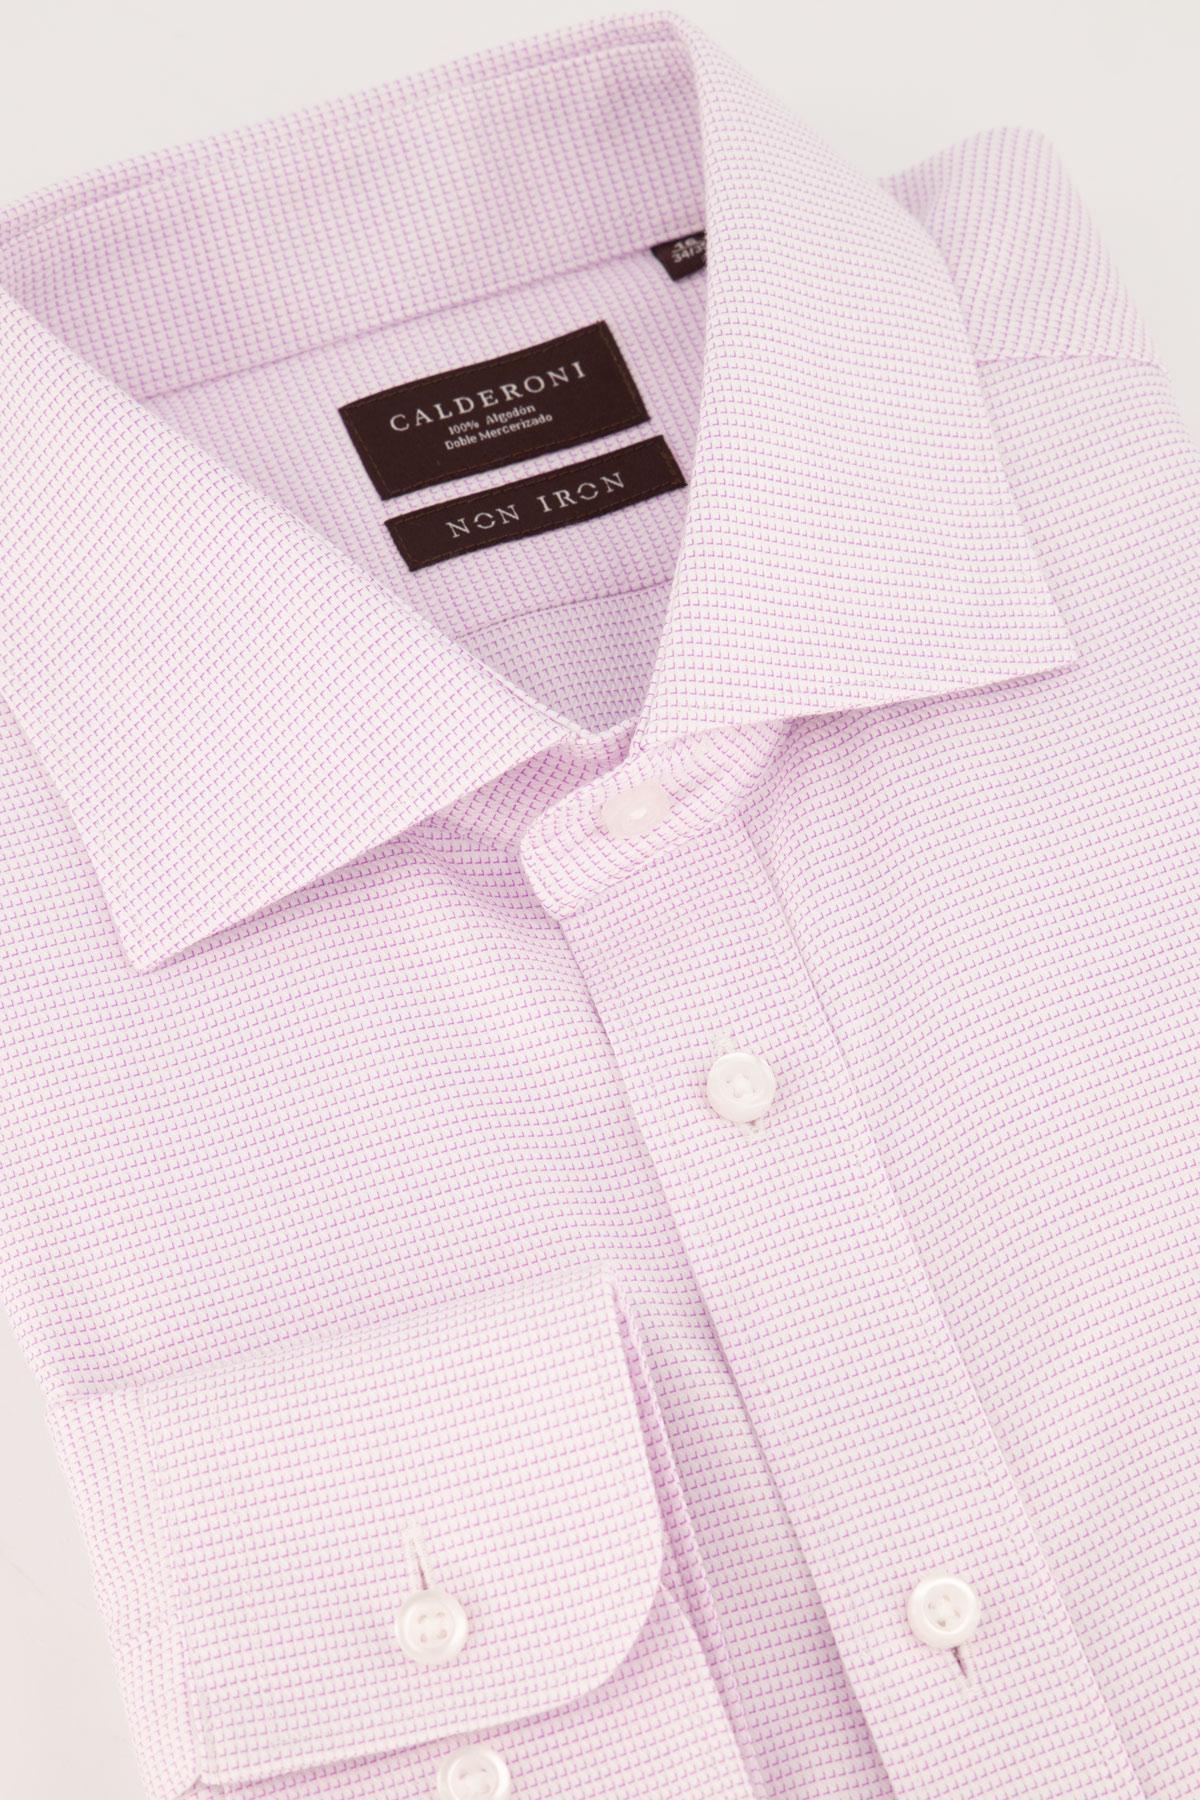 Camisa Calderoni -Non Iron 24/7 - micro diseño rosa.